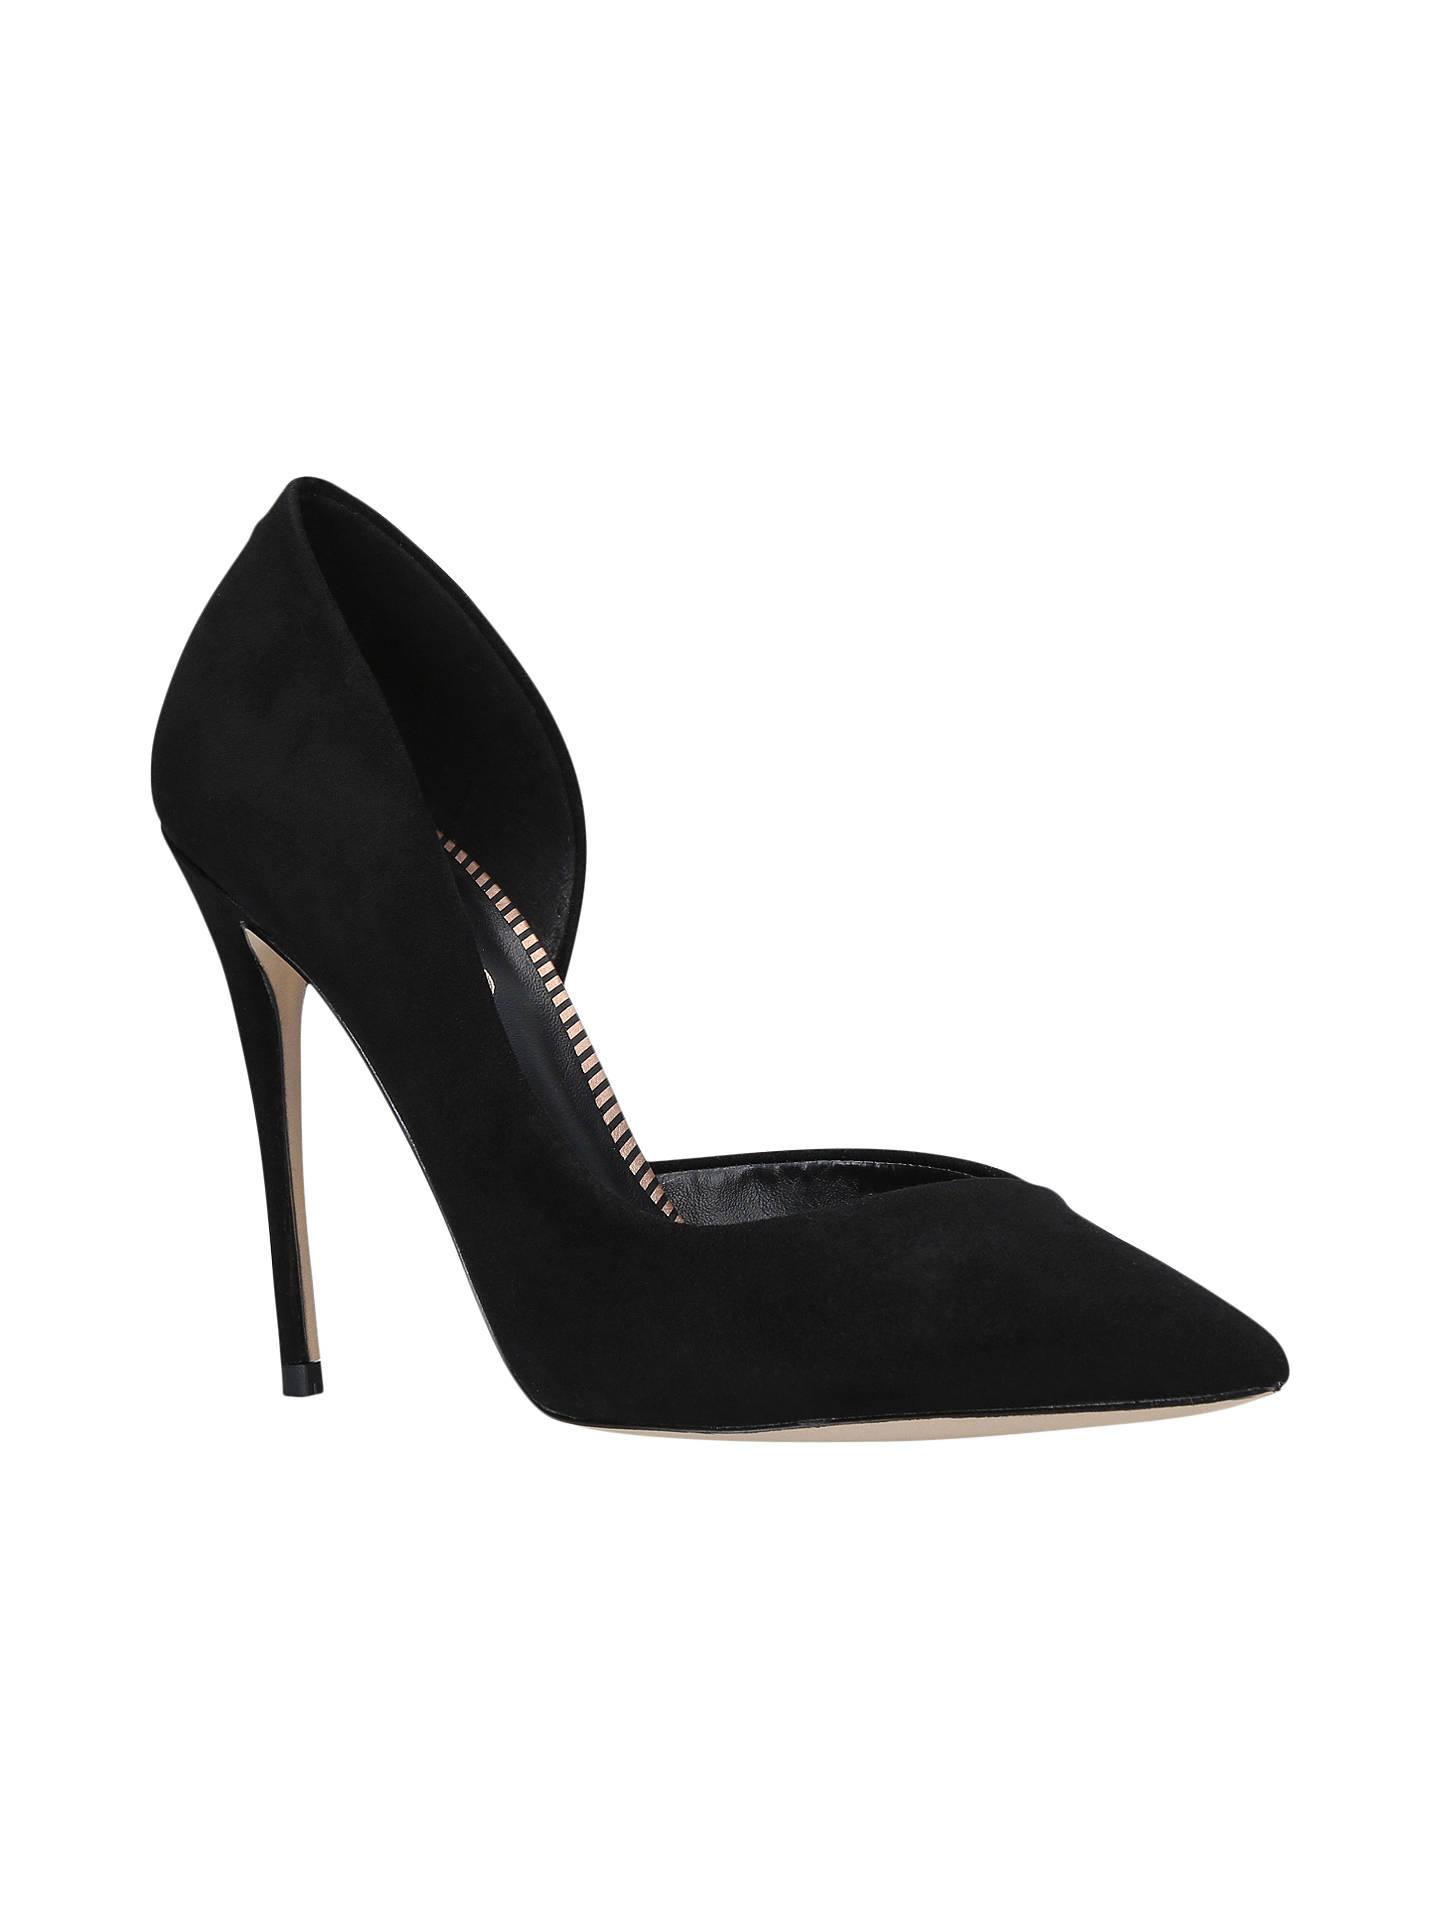 fee9fc5cdb9 Miss KG Alexandra High Heel Pointed Toe Court Shoes, Black at John ...